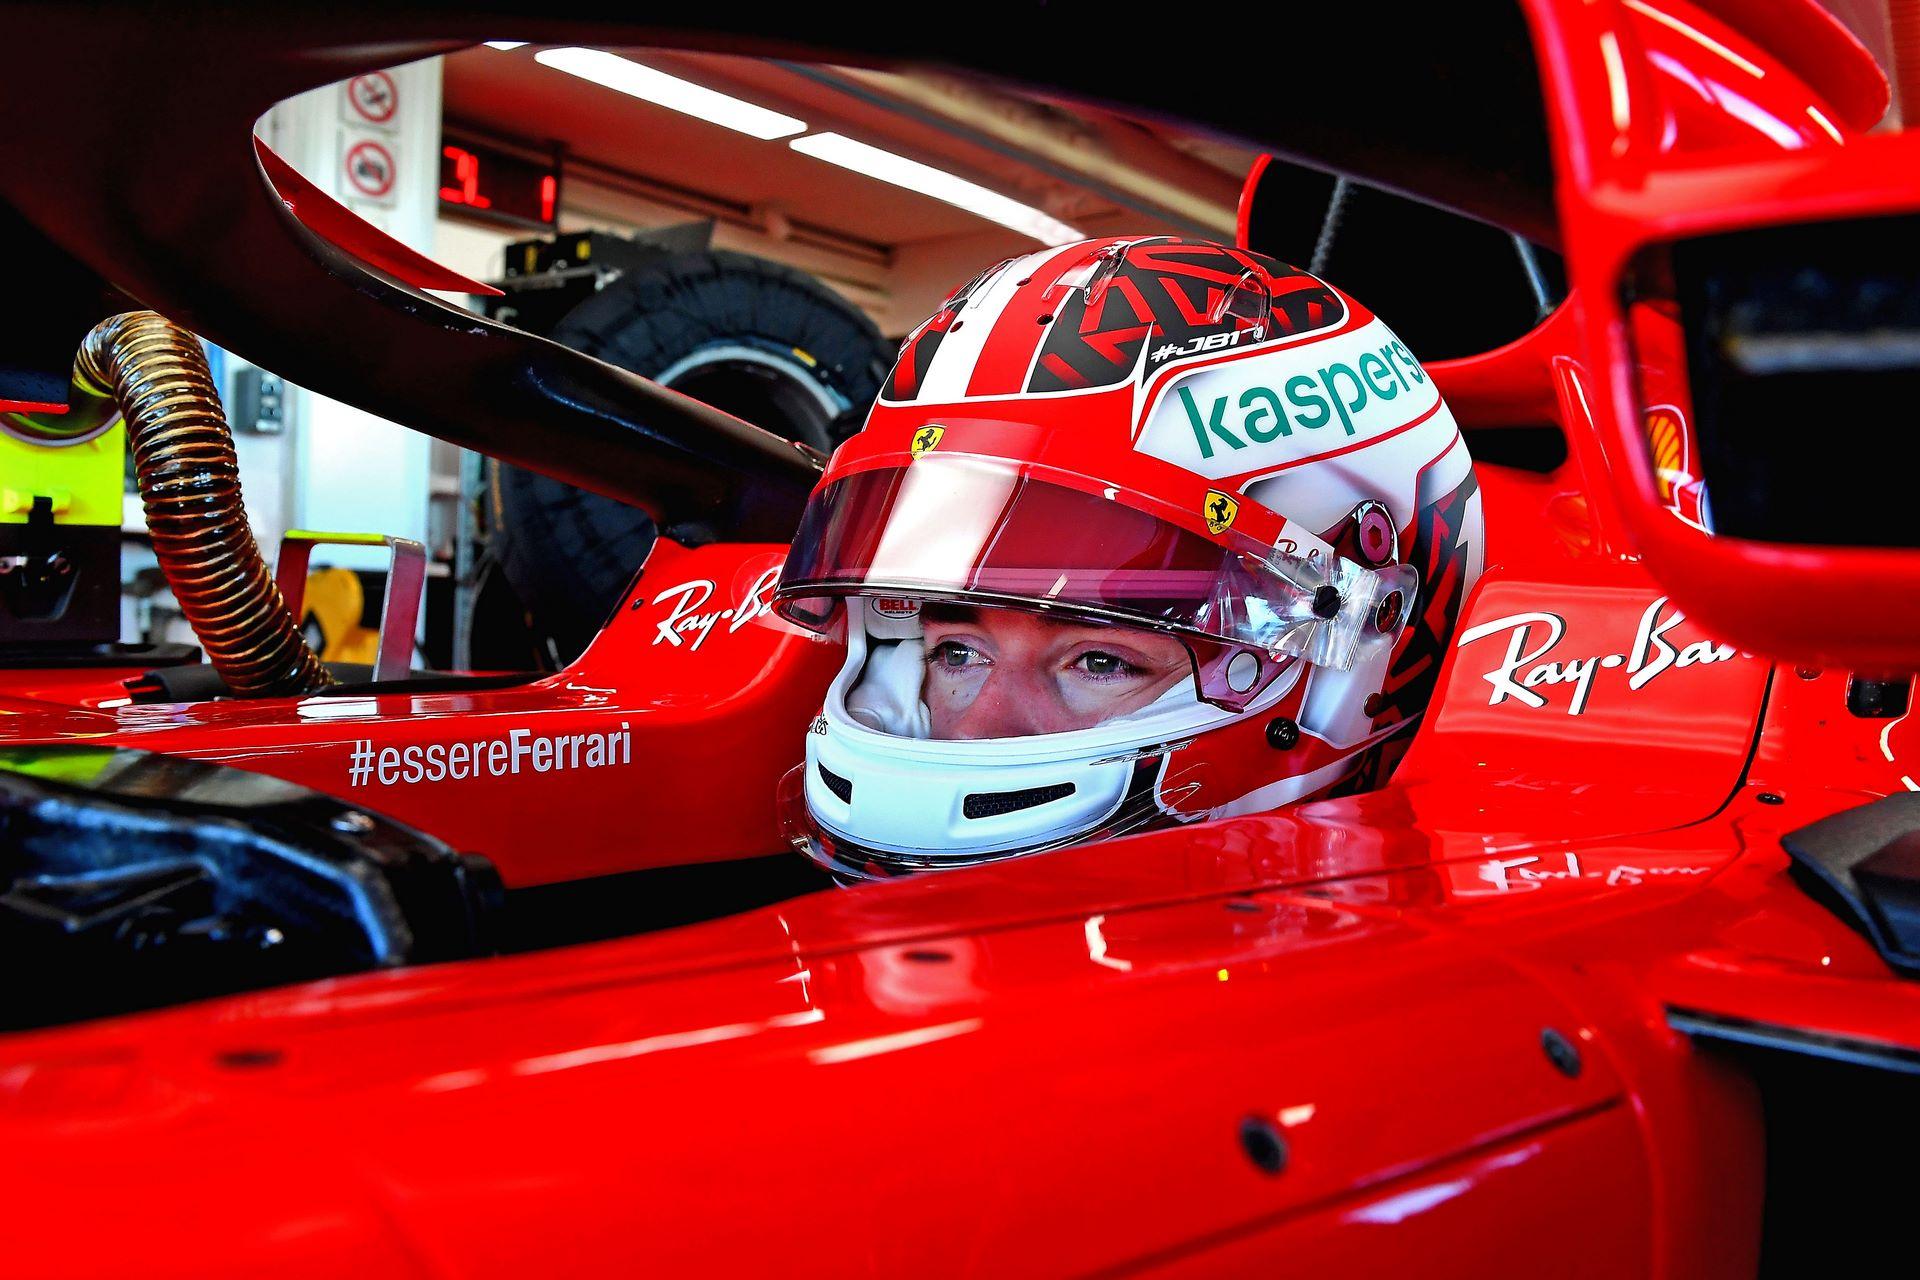 F1 TEST FIORANO - MARTEDì 26/01/21 - CHARLES LECLERC